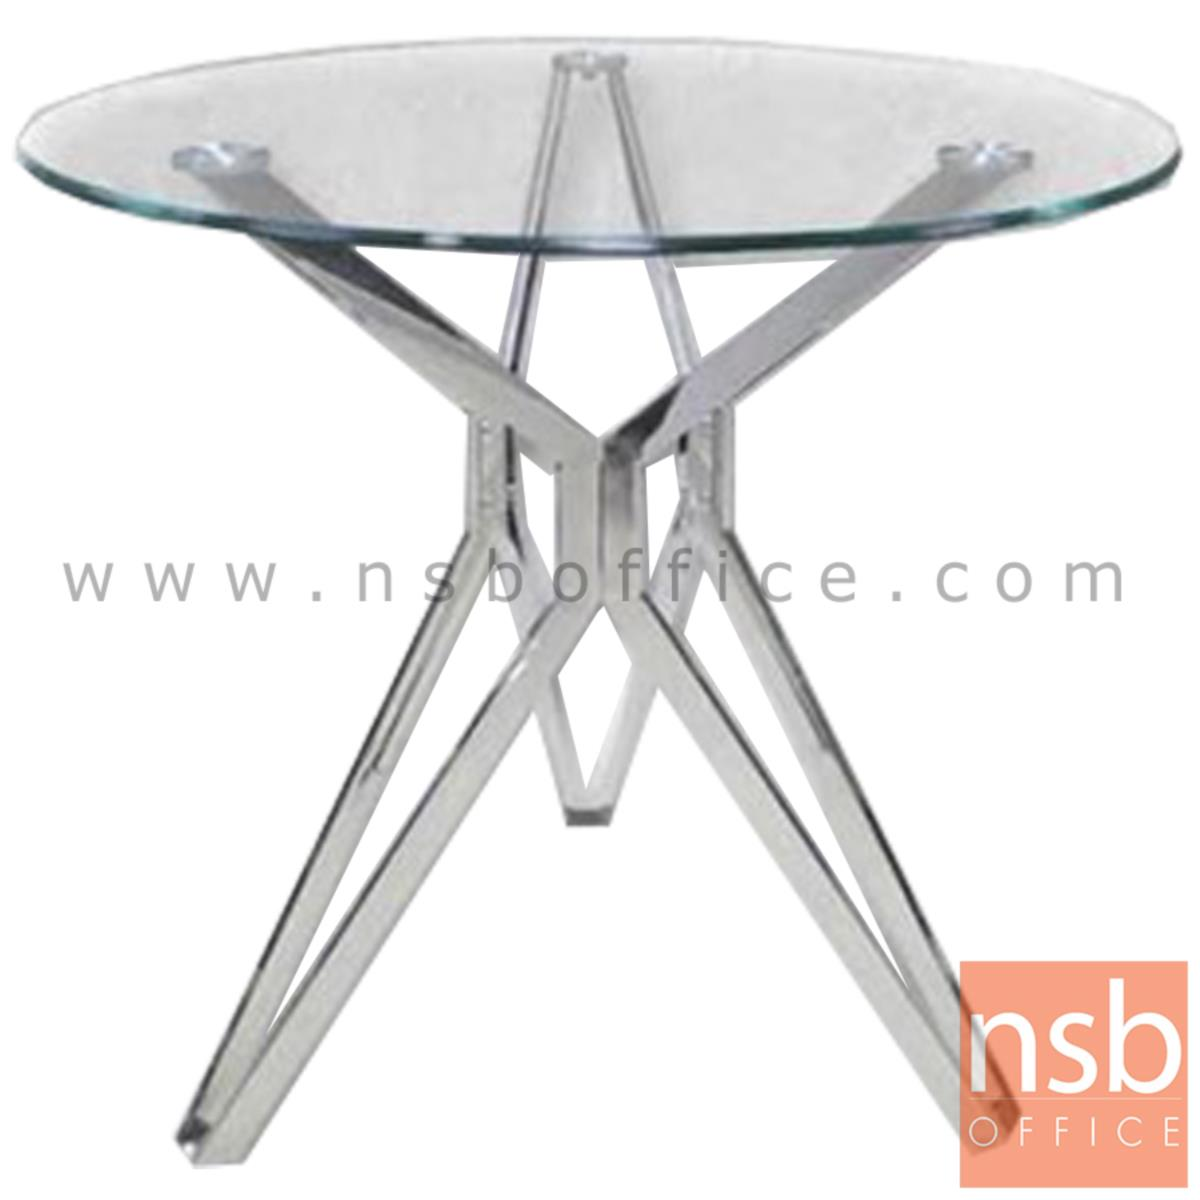 A09A140:โต๊ะกลมหน้ากระจก รุ่น JUZCAR (ยุซคาร์) ขนาด 80Di cm.